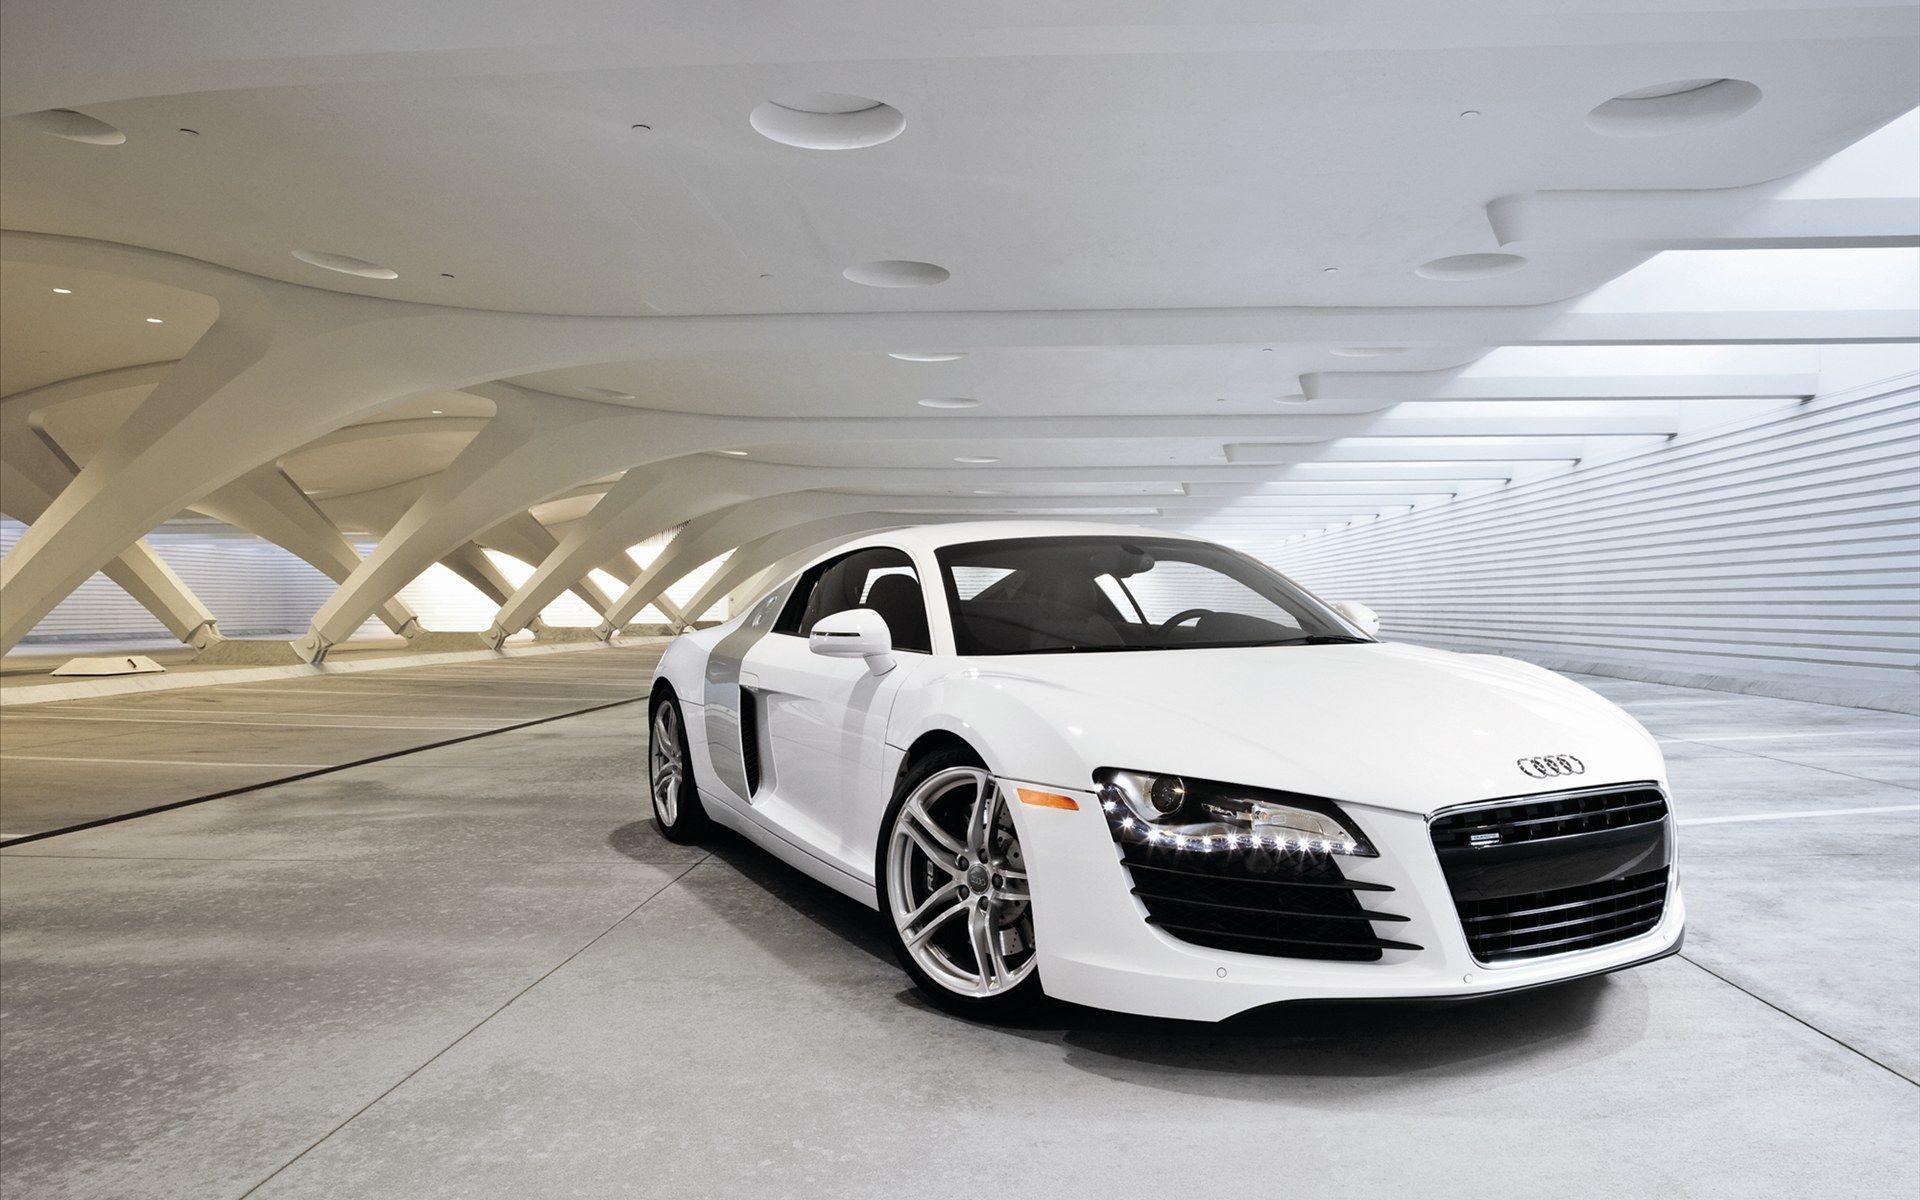 Audi Car Wallpapers Top Free Audi Car Backgrounds